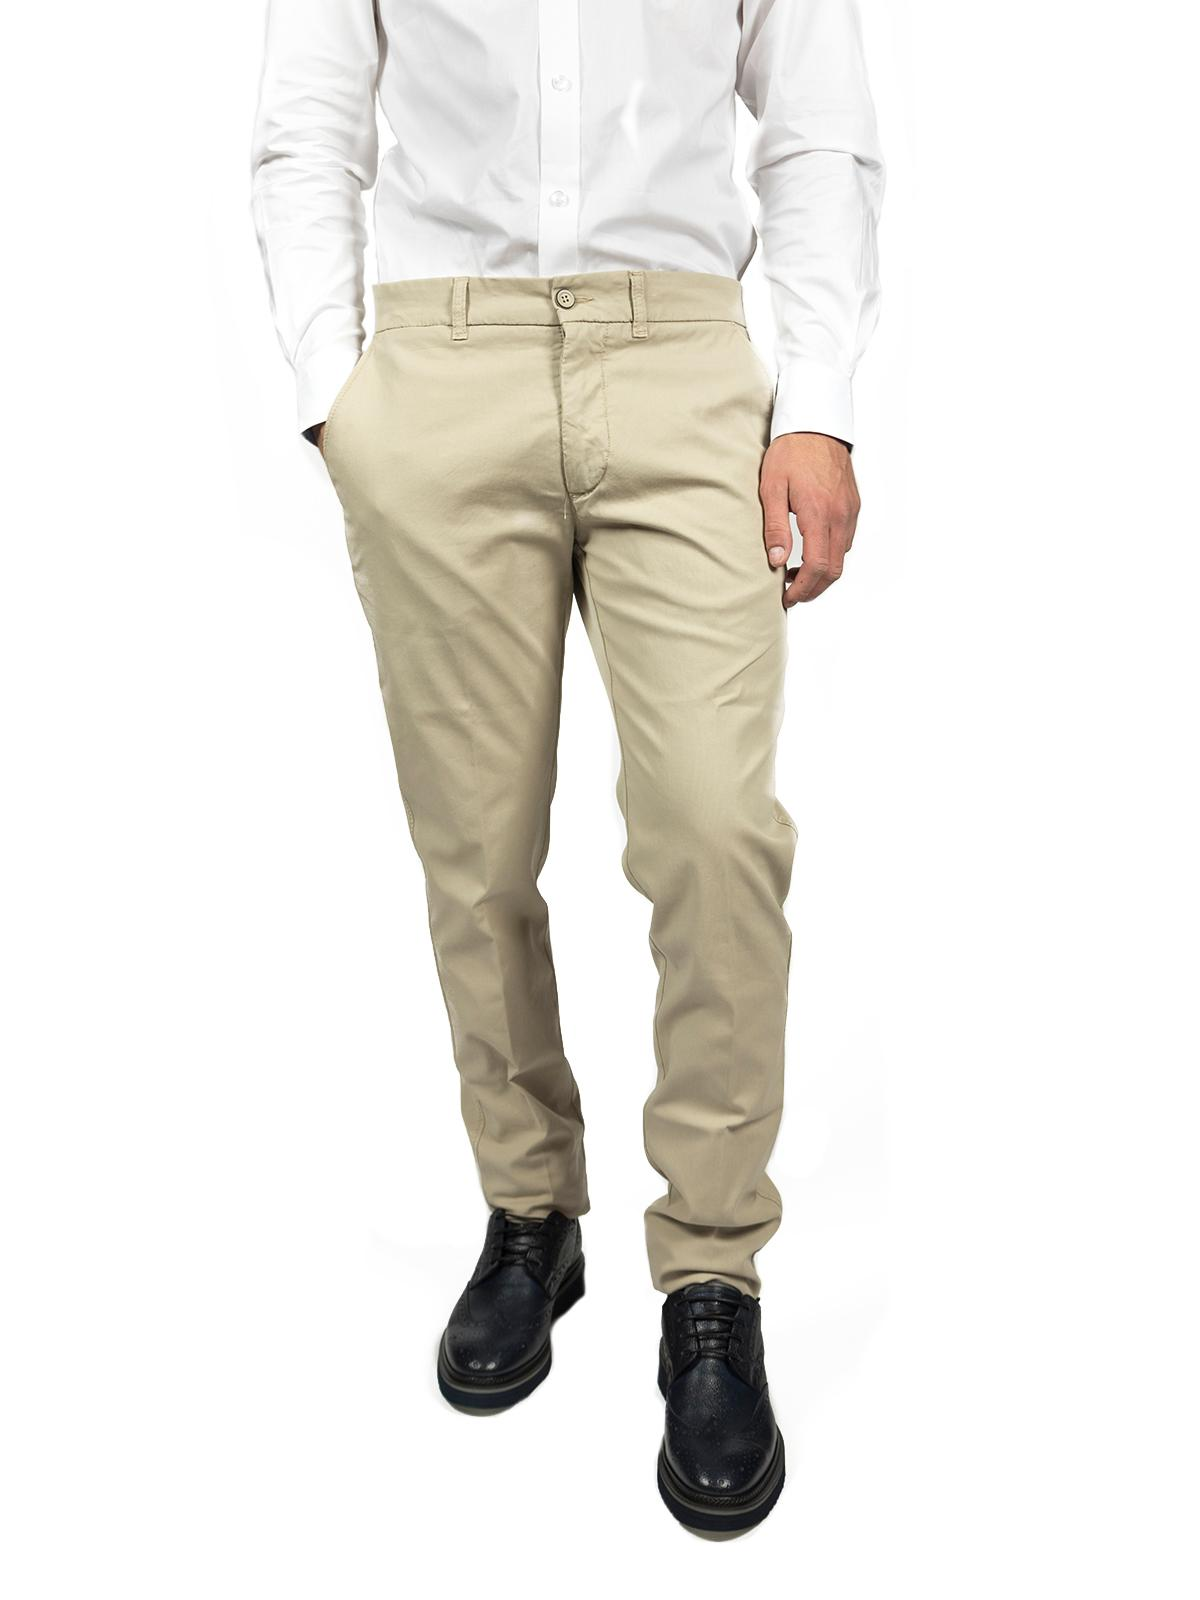 Harmont & Blaine -  Pantalone uomo - W03339 052745 OVER